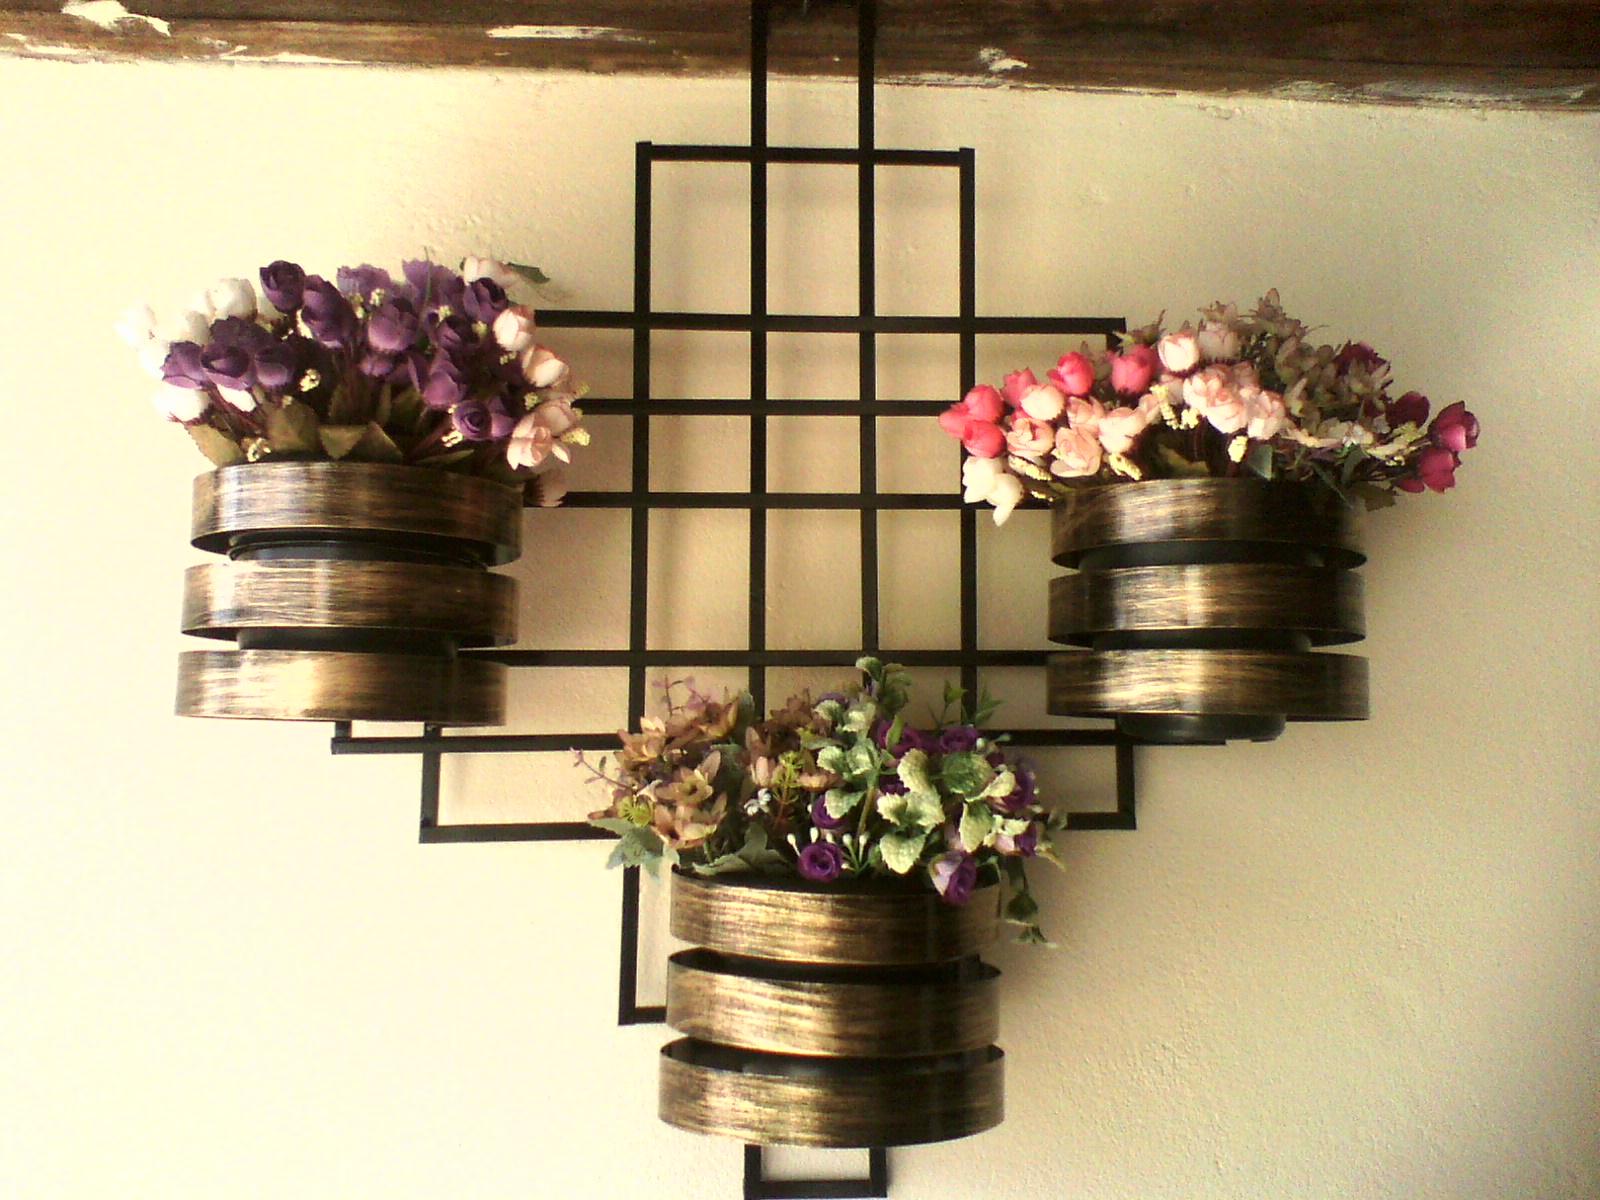 trelica jardim vertical:trelica para jardim vertical com vasos jardim trelica para jardim